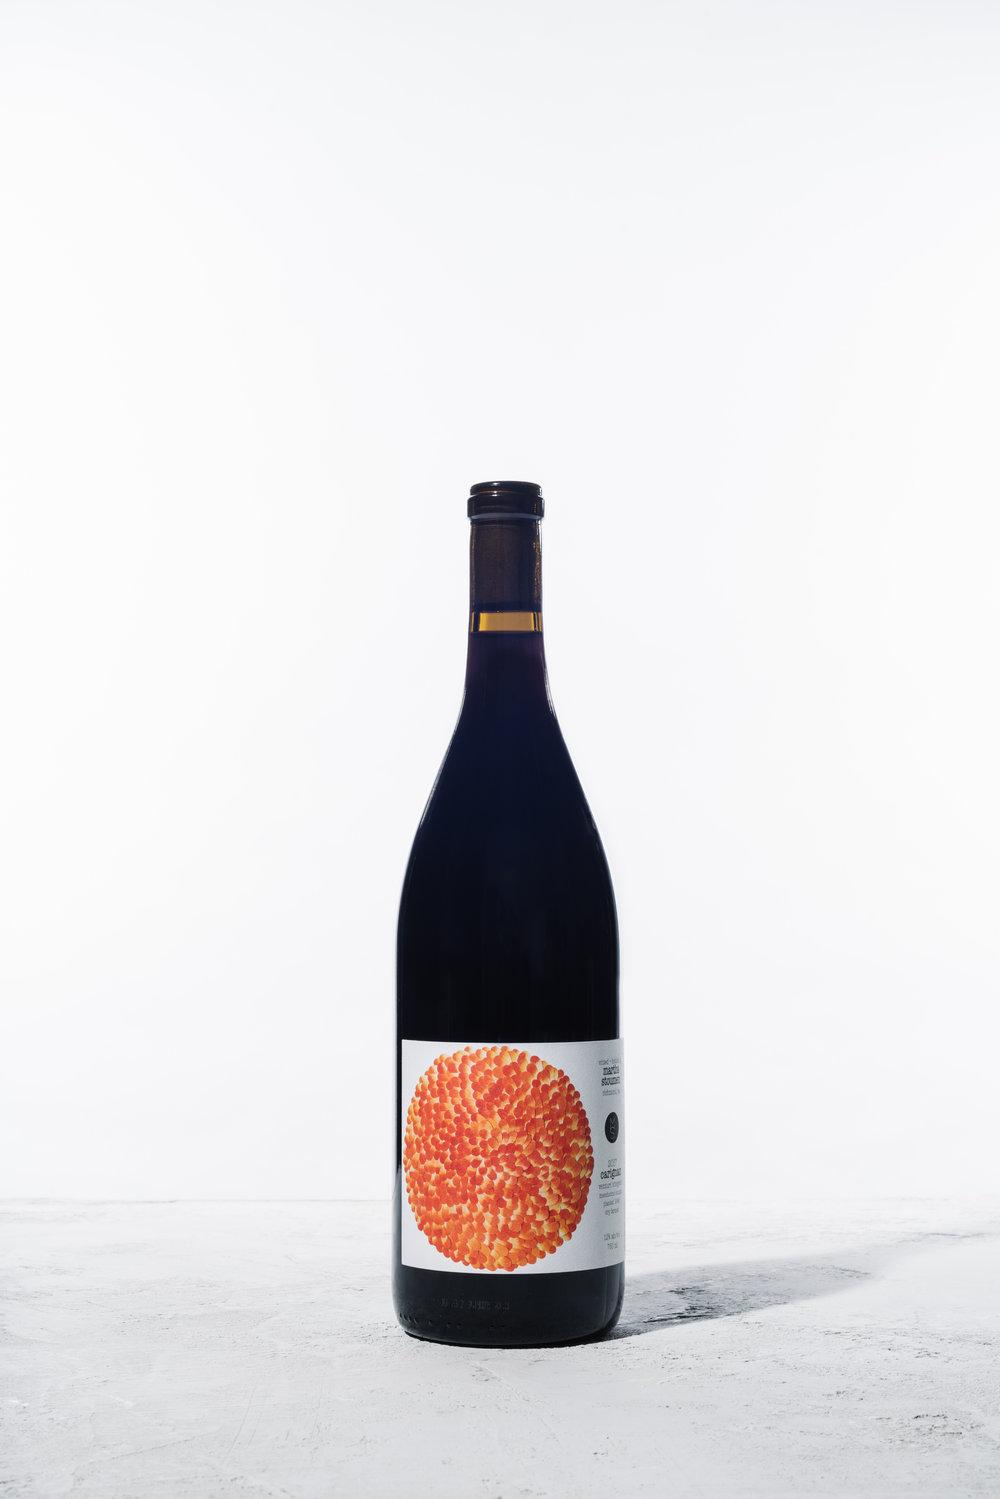 Venturi Vineyard Carignan 2017 | $35